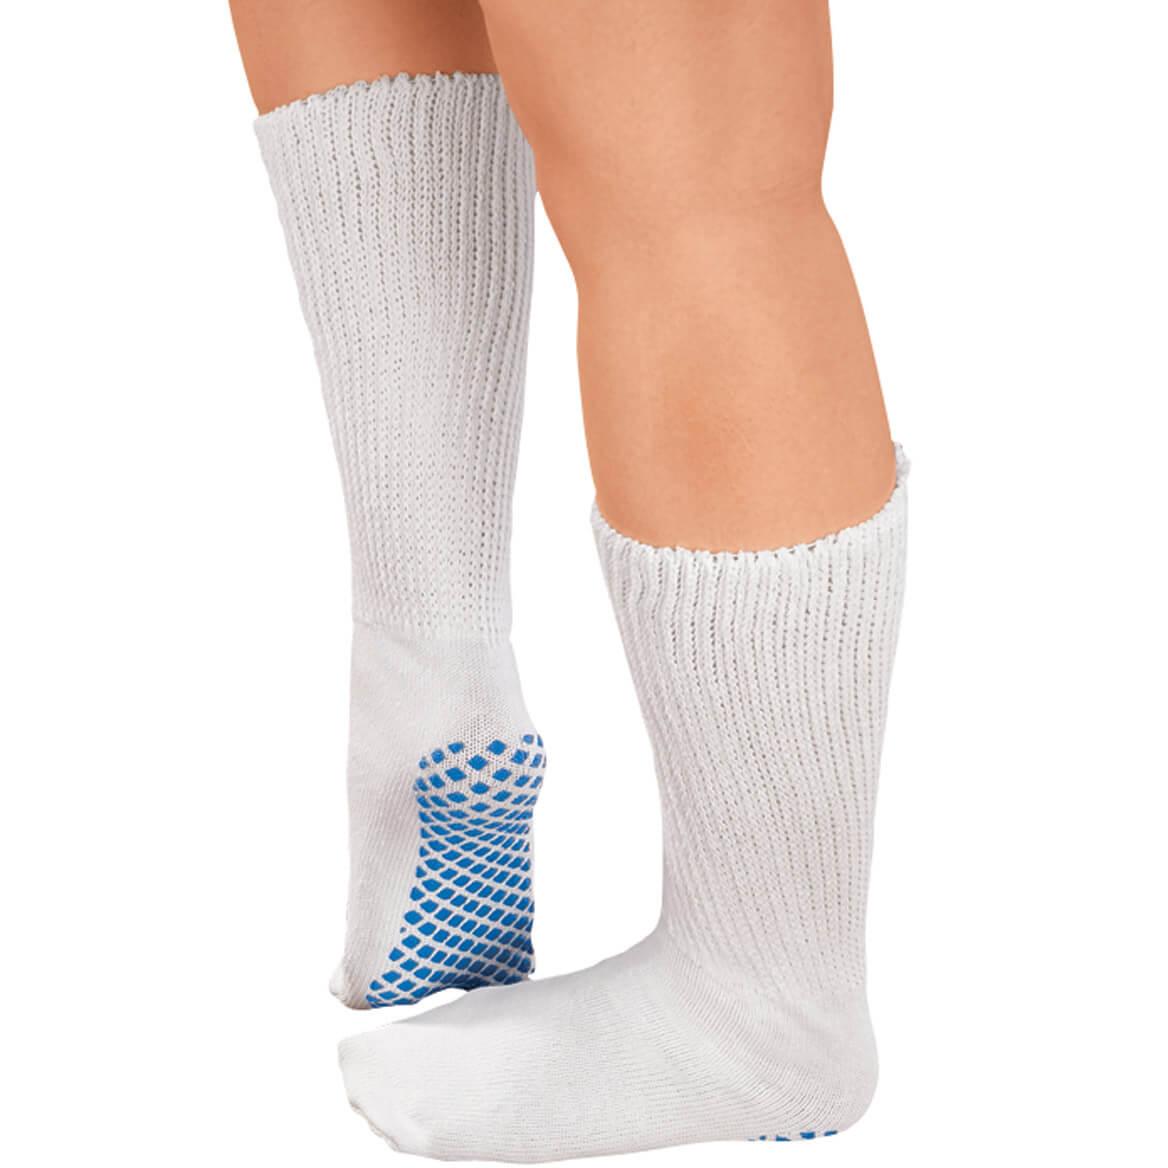 Diabetic Slipper Socks With Gripper Soles-336019